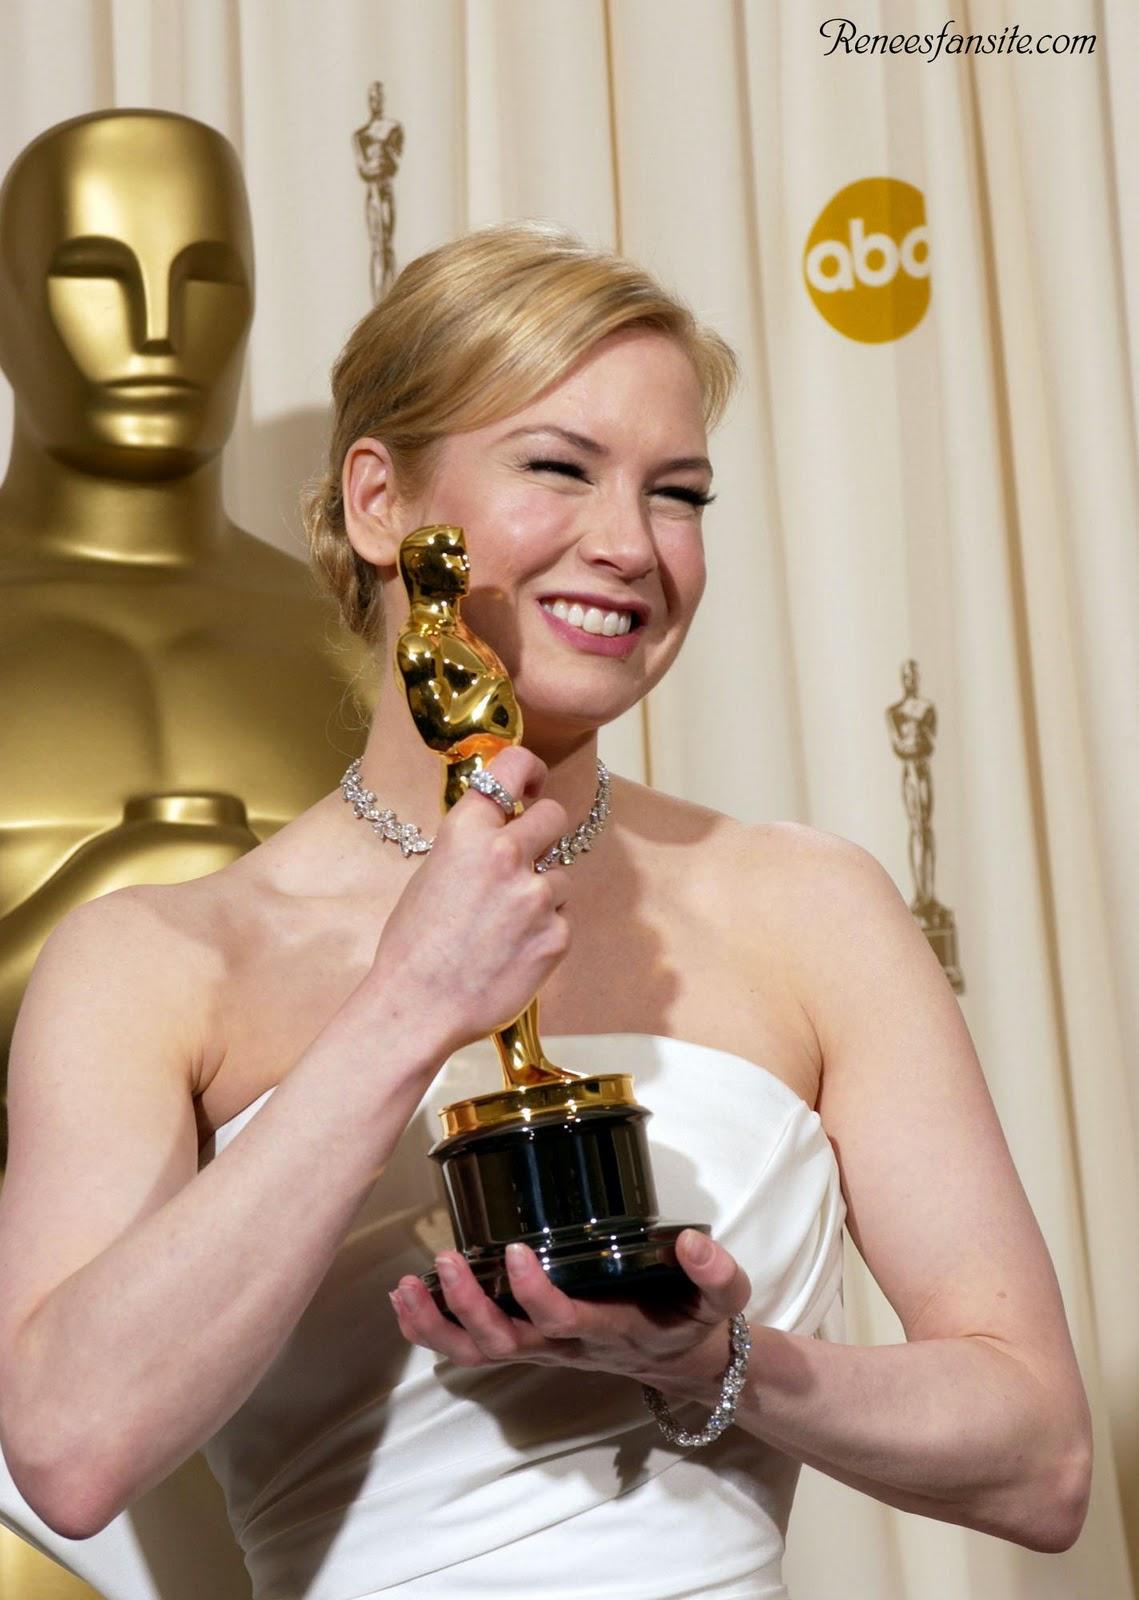 http://2.bp.blogspot.com/_MnSnyxwEjPo/TK0g7rQEezI/AAAAAAAAATs/kRrCdN-C0fw/s1600/2004_Oscars_Renee_Zellweger.jpg